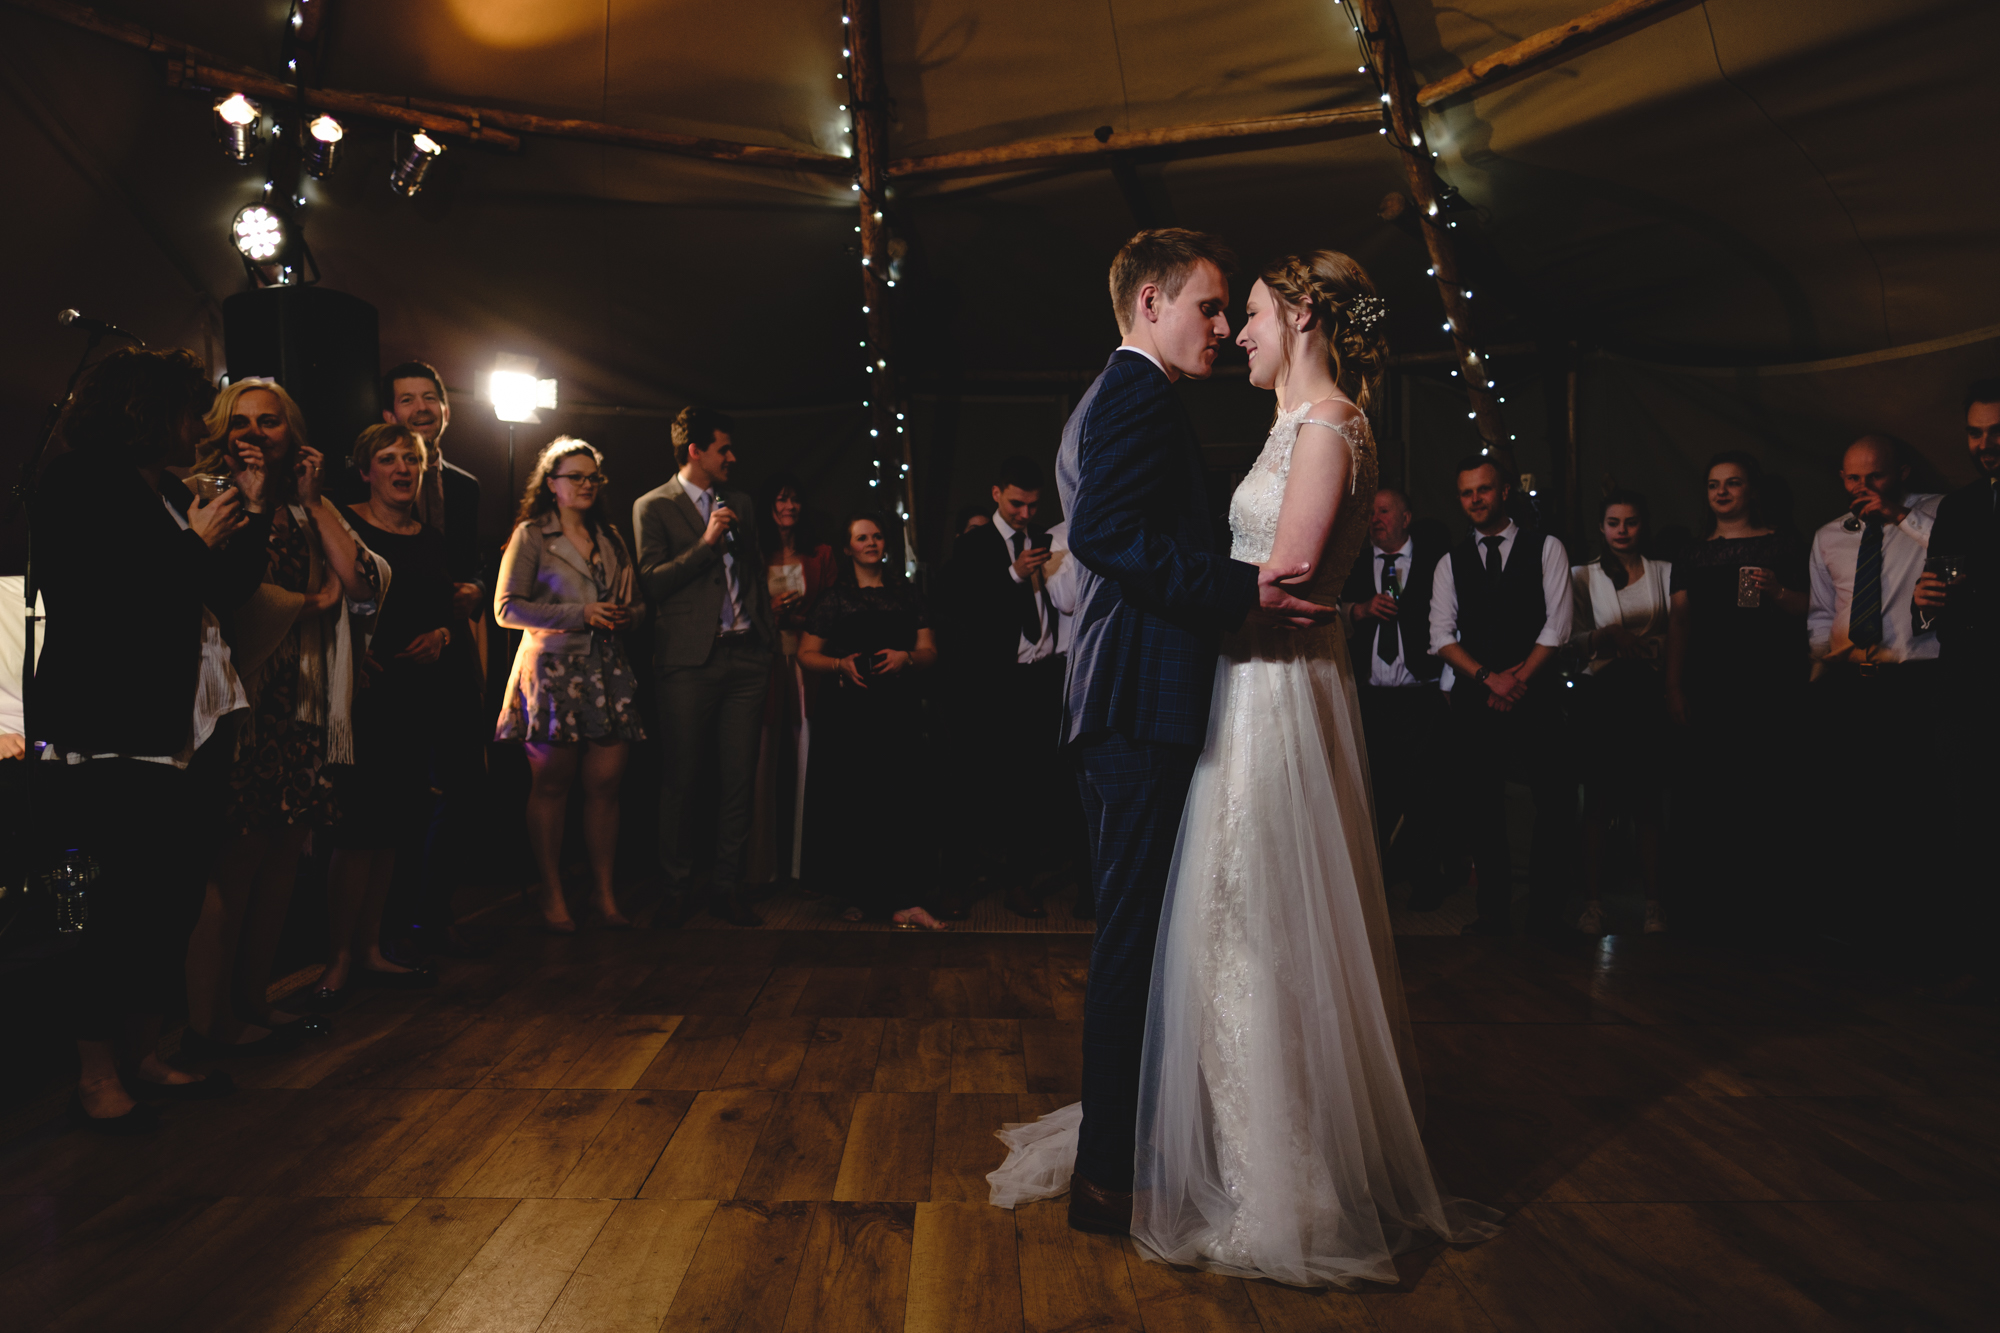 Katie and Dode weddings (193 of 207).jpg